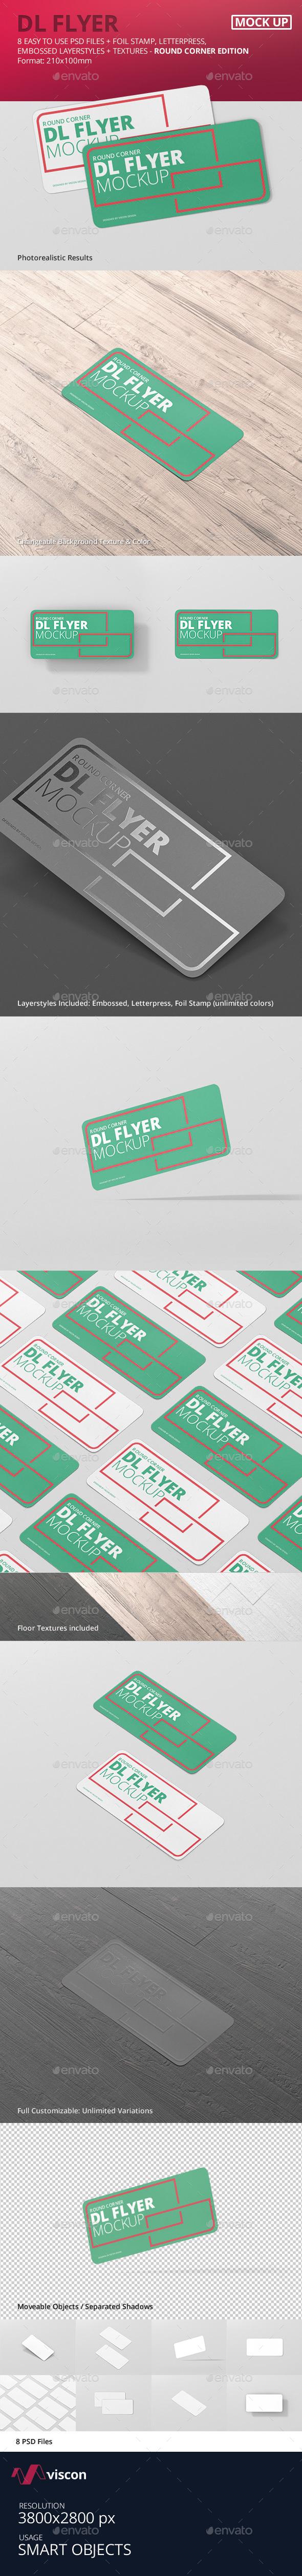 DL Horizontal Flyer Round Corner Mockup - Flyers Print